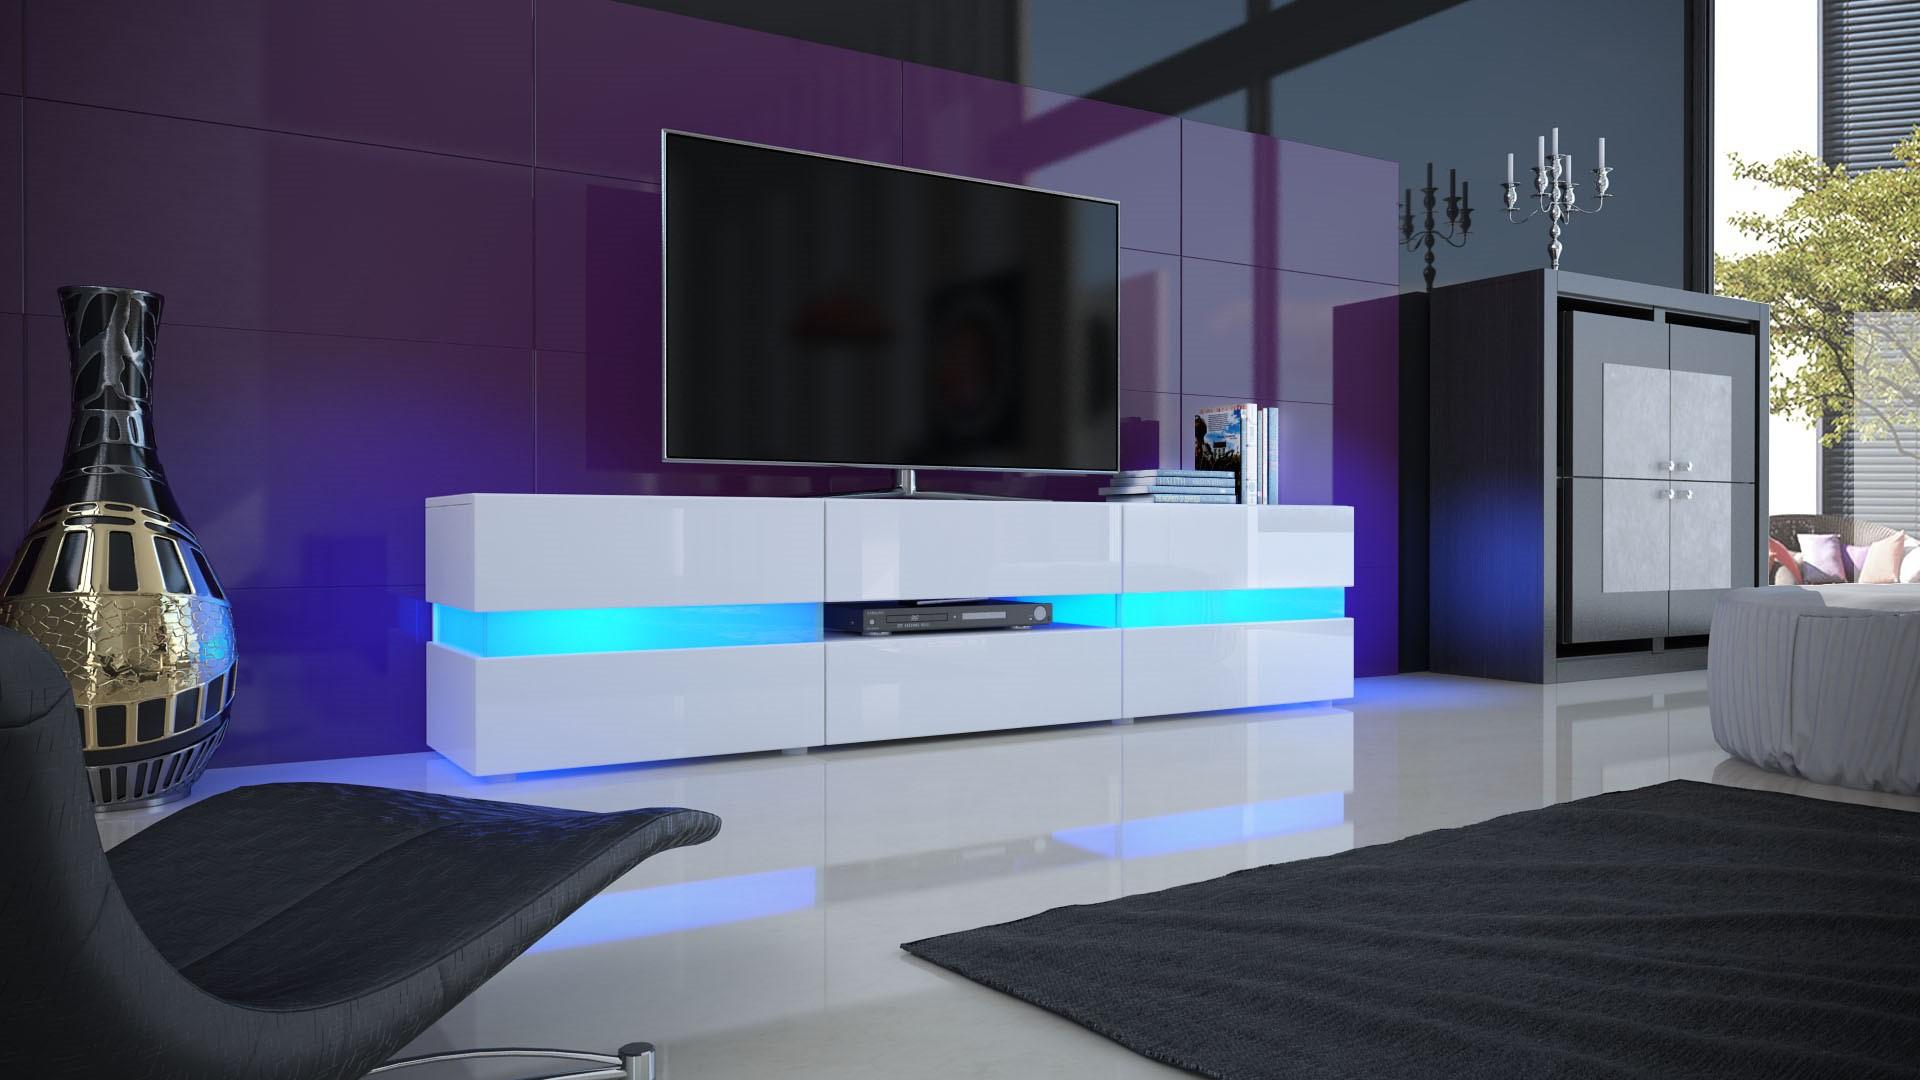 conforama tv led tlviseur led cm schneider ldscnfhb pas cher prix promo tlviseur conforama uac. Black Bedroom Furniture Sets. Home Design Ideas